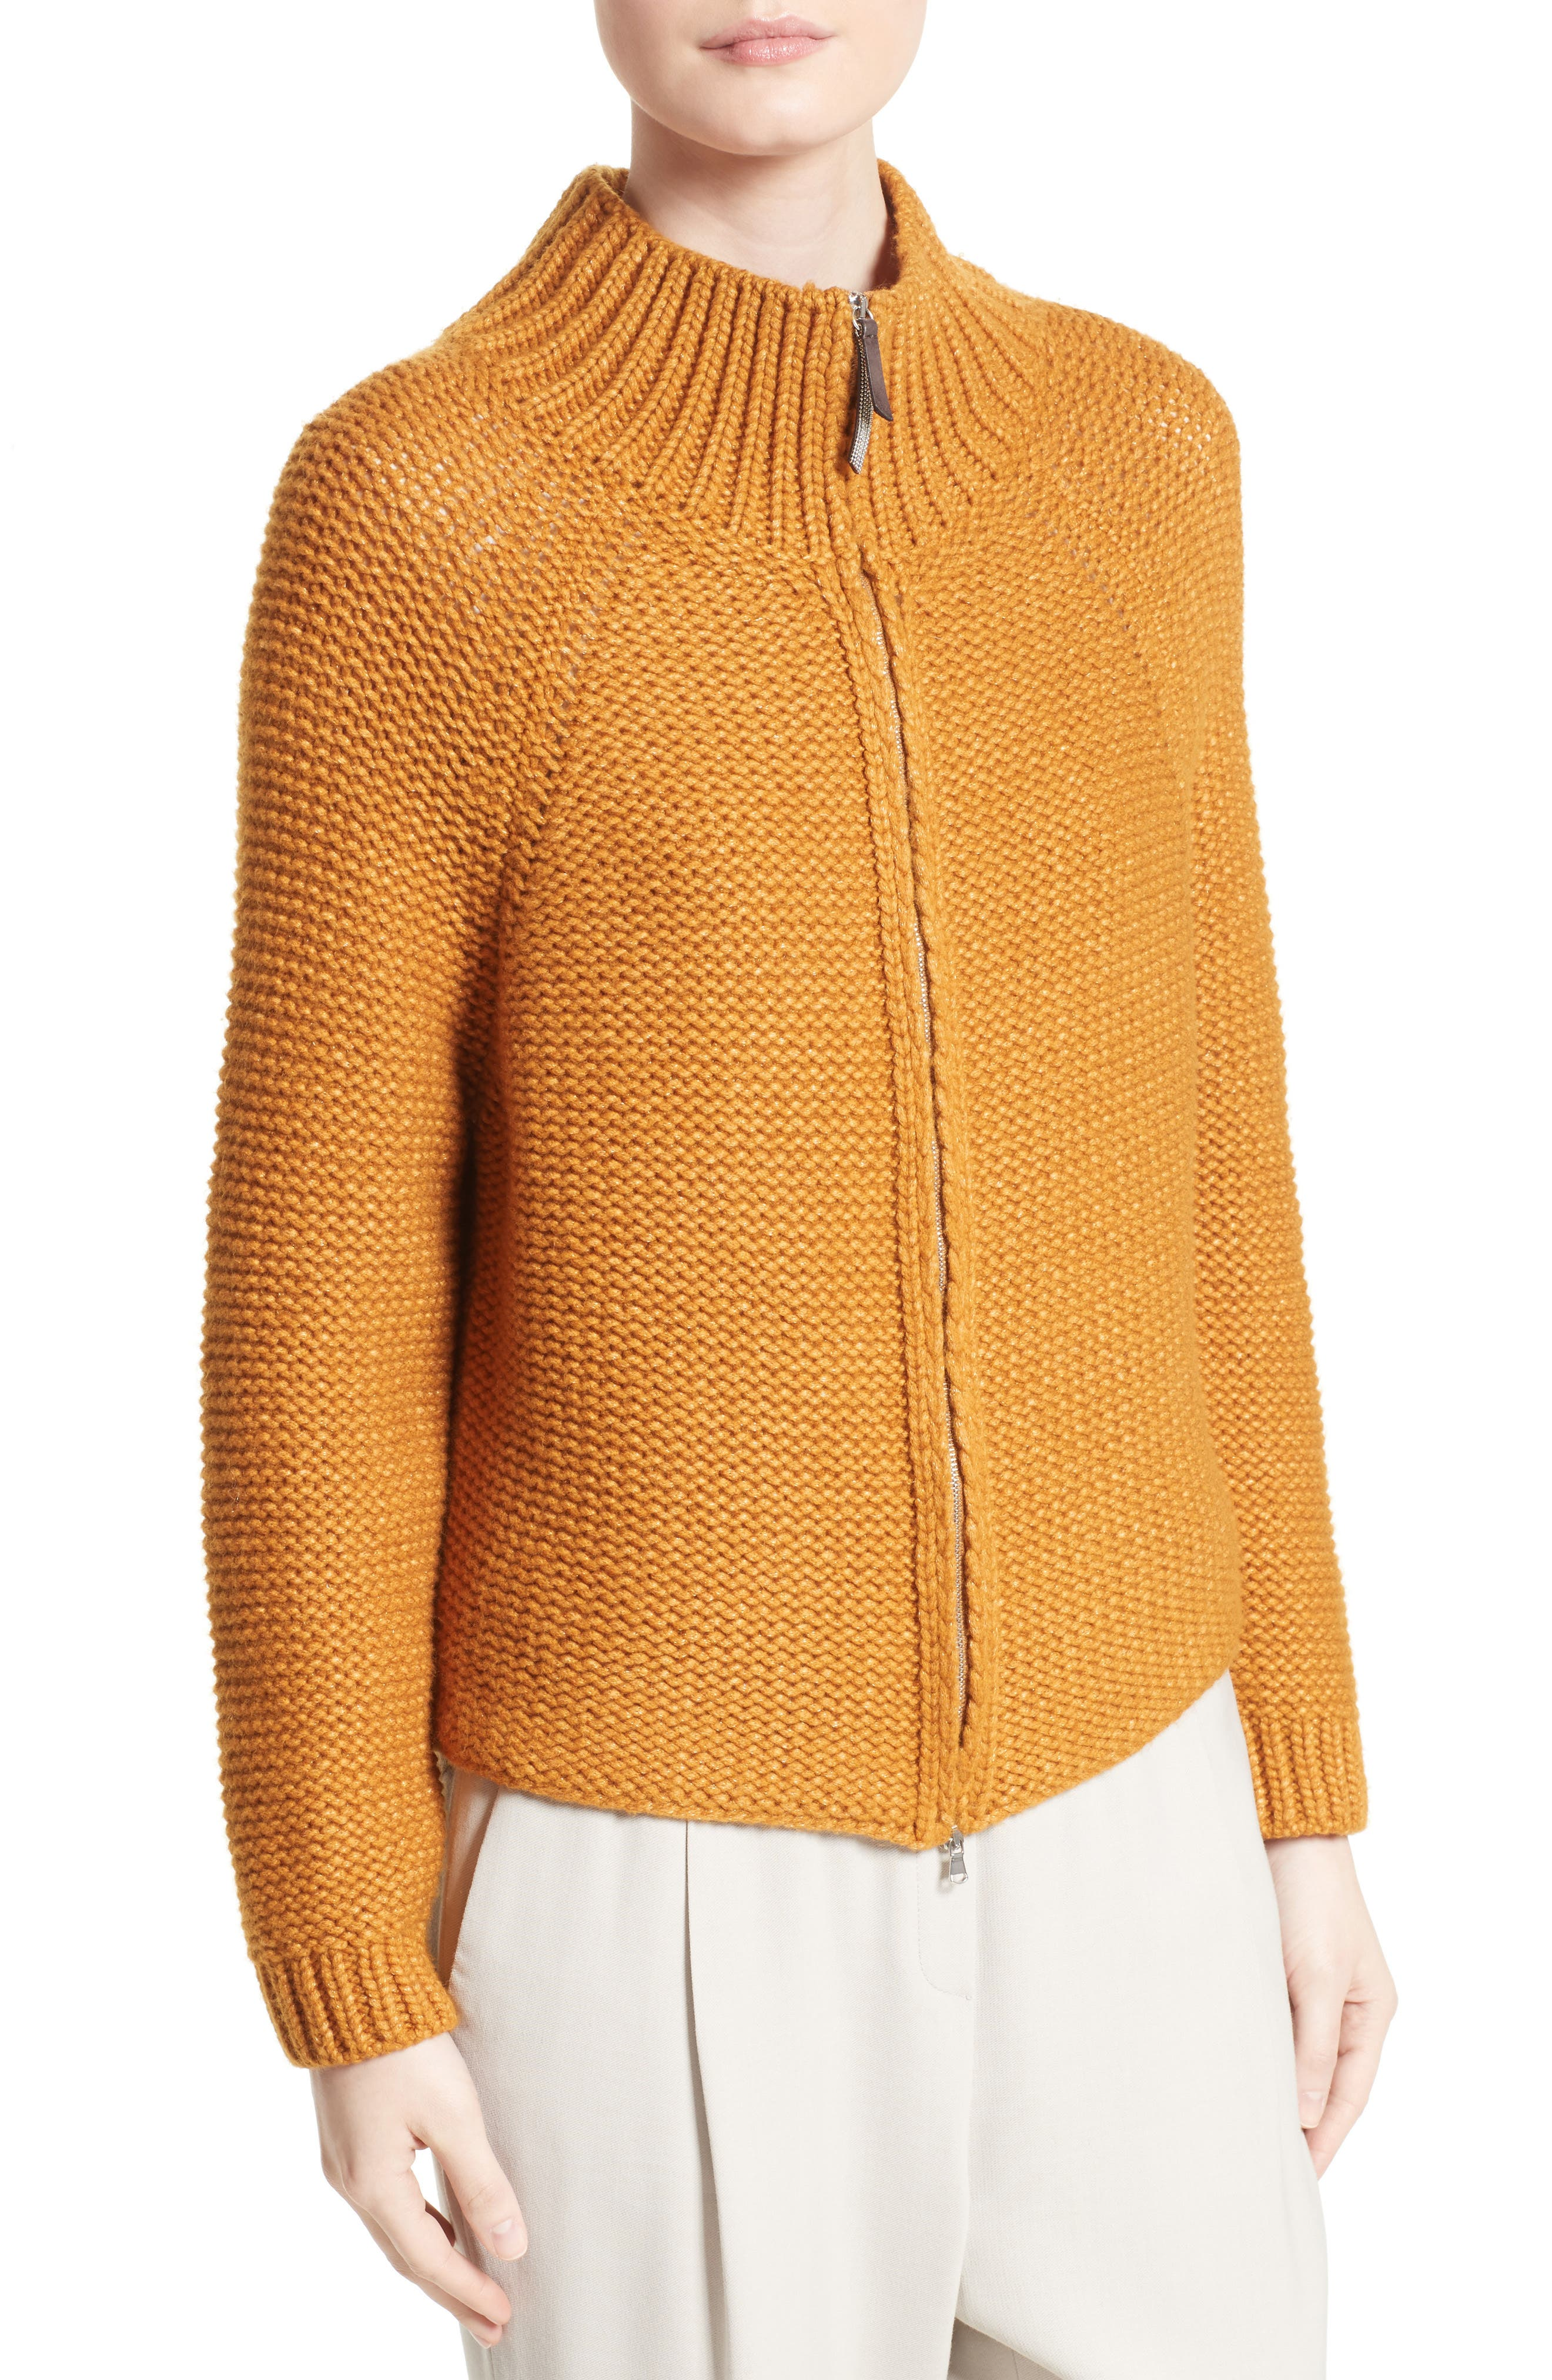 Knit Wool Blend Cardigan,                             Alternate thumbnail 4, color,                             220